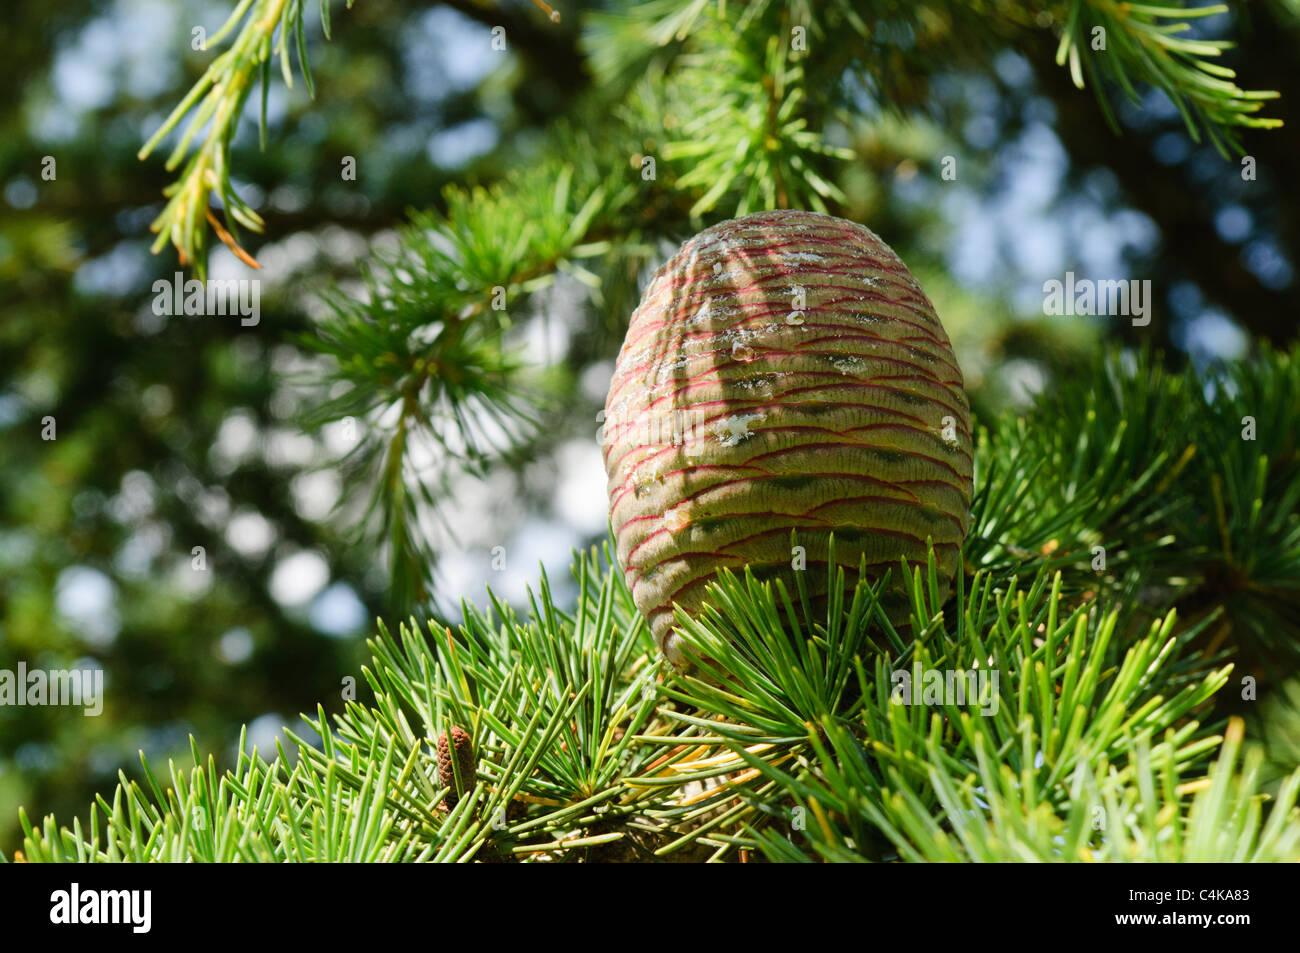 Cone of a Lebanese Cedar (Cedrus libani) - Stock Image